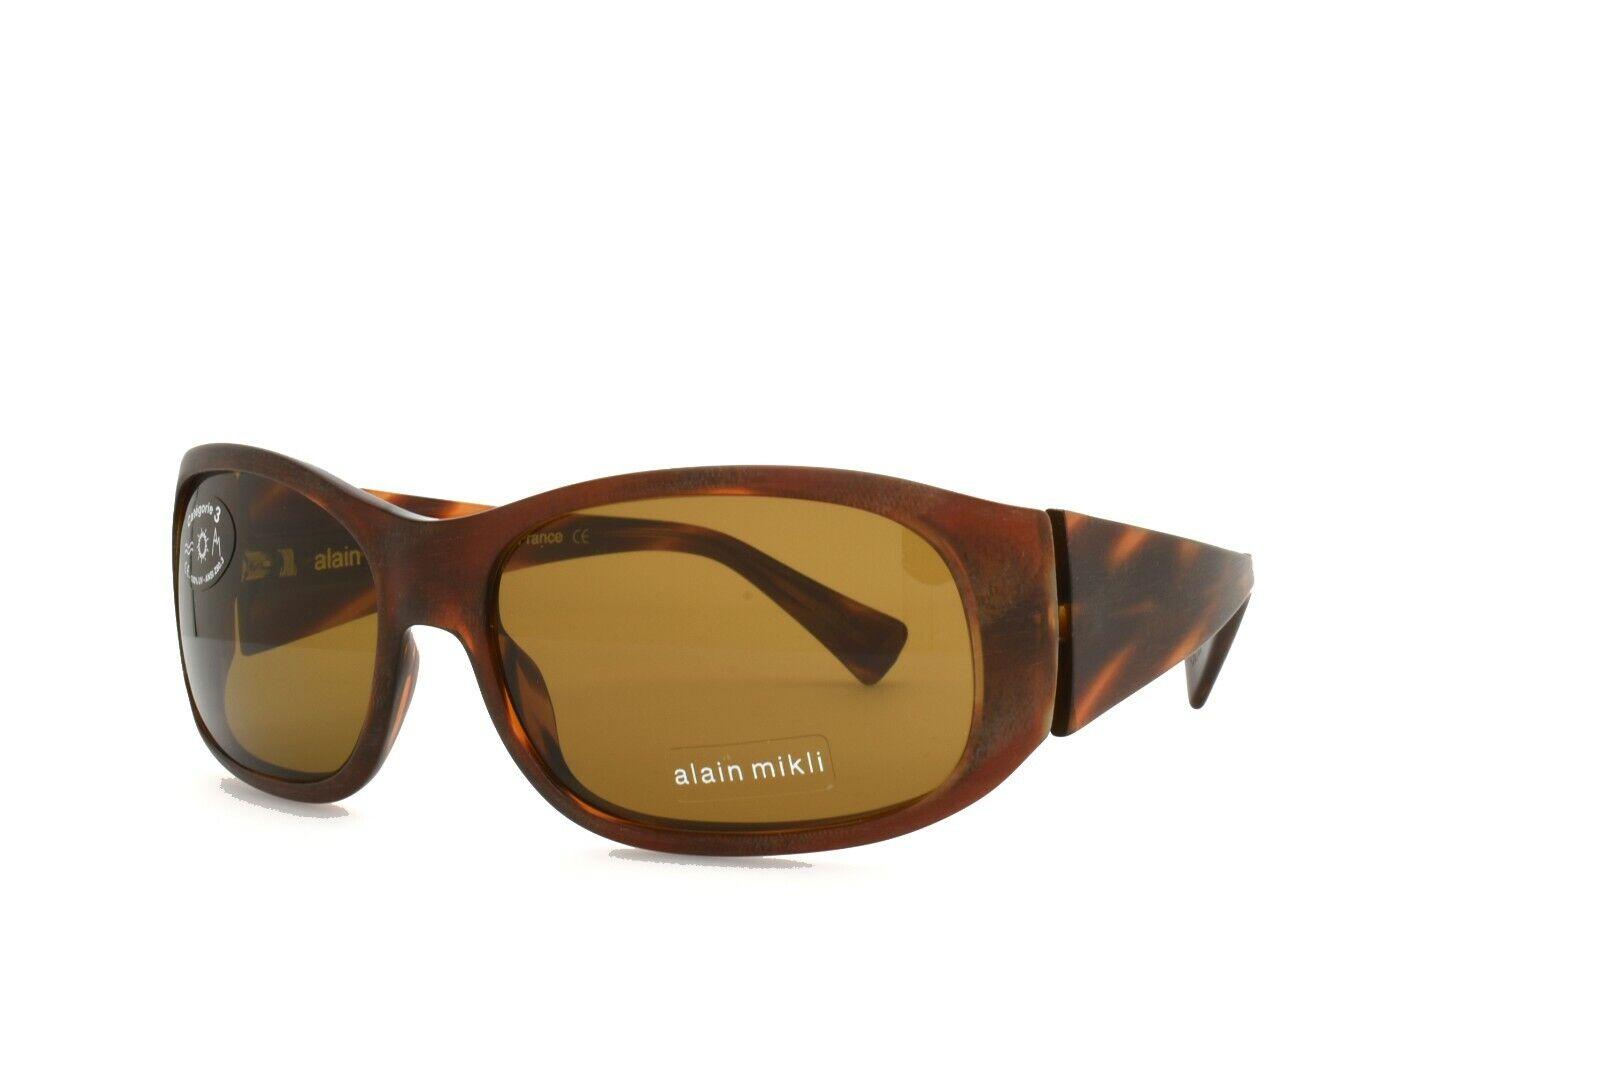 Alain Mikli SUNGLASSES Brown 1060 0002 New Authentic 58mm